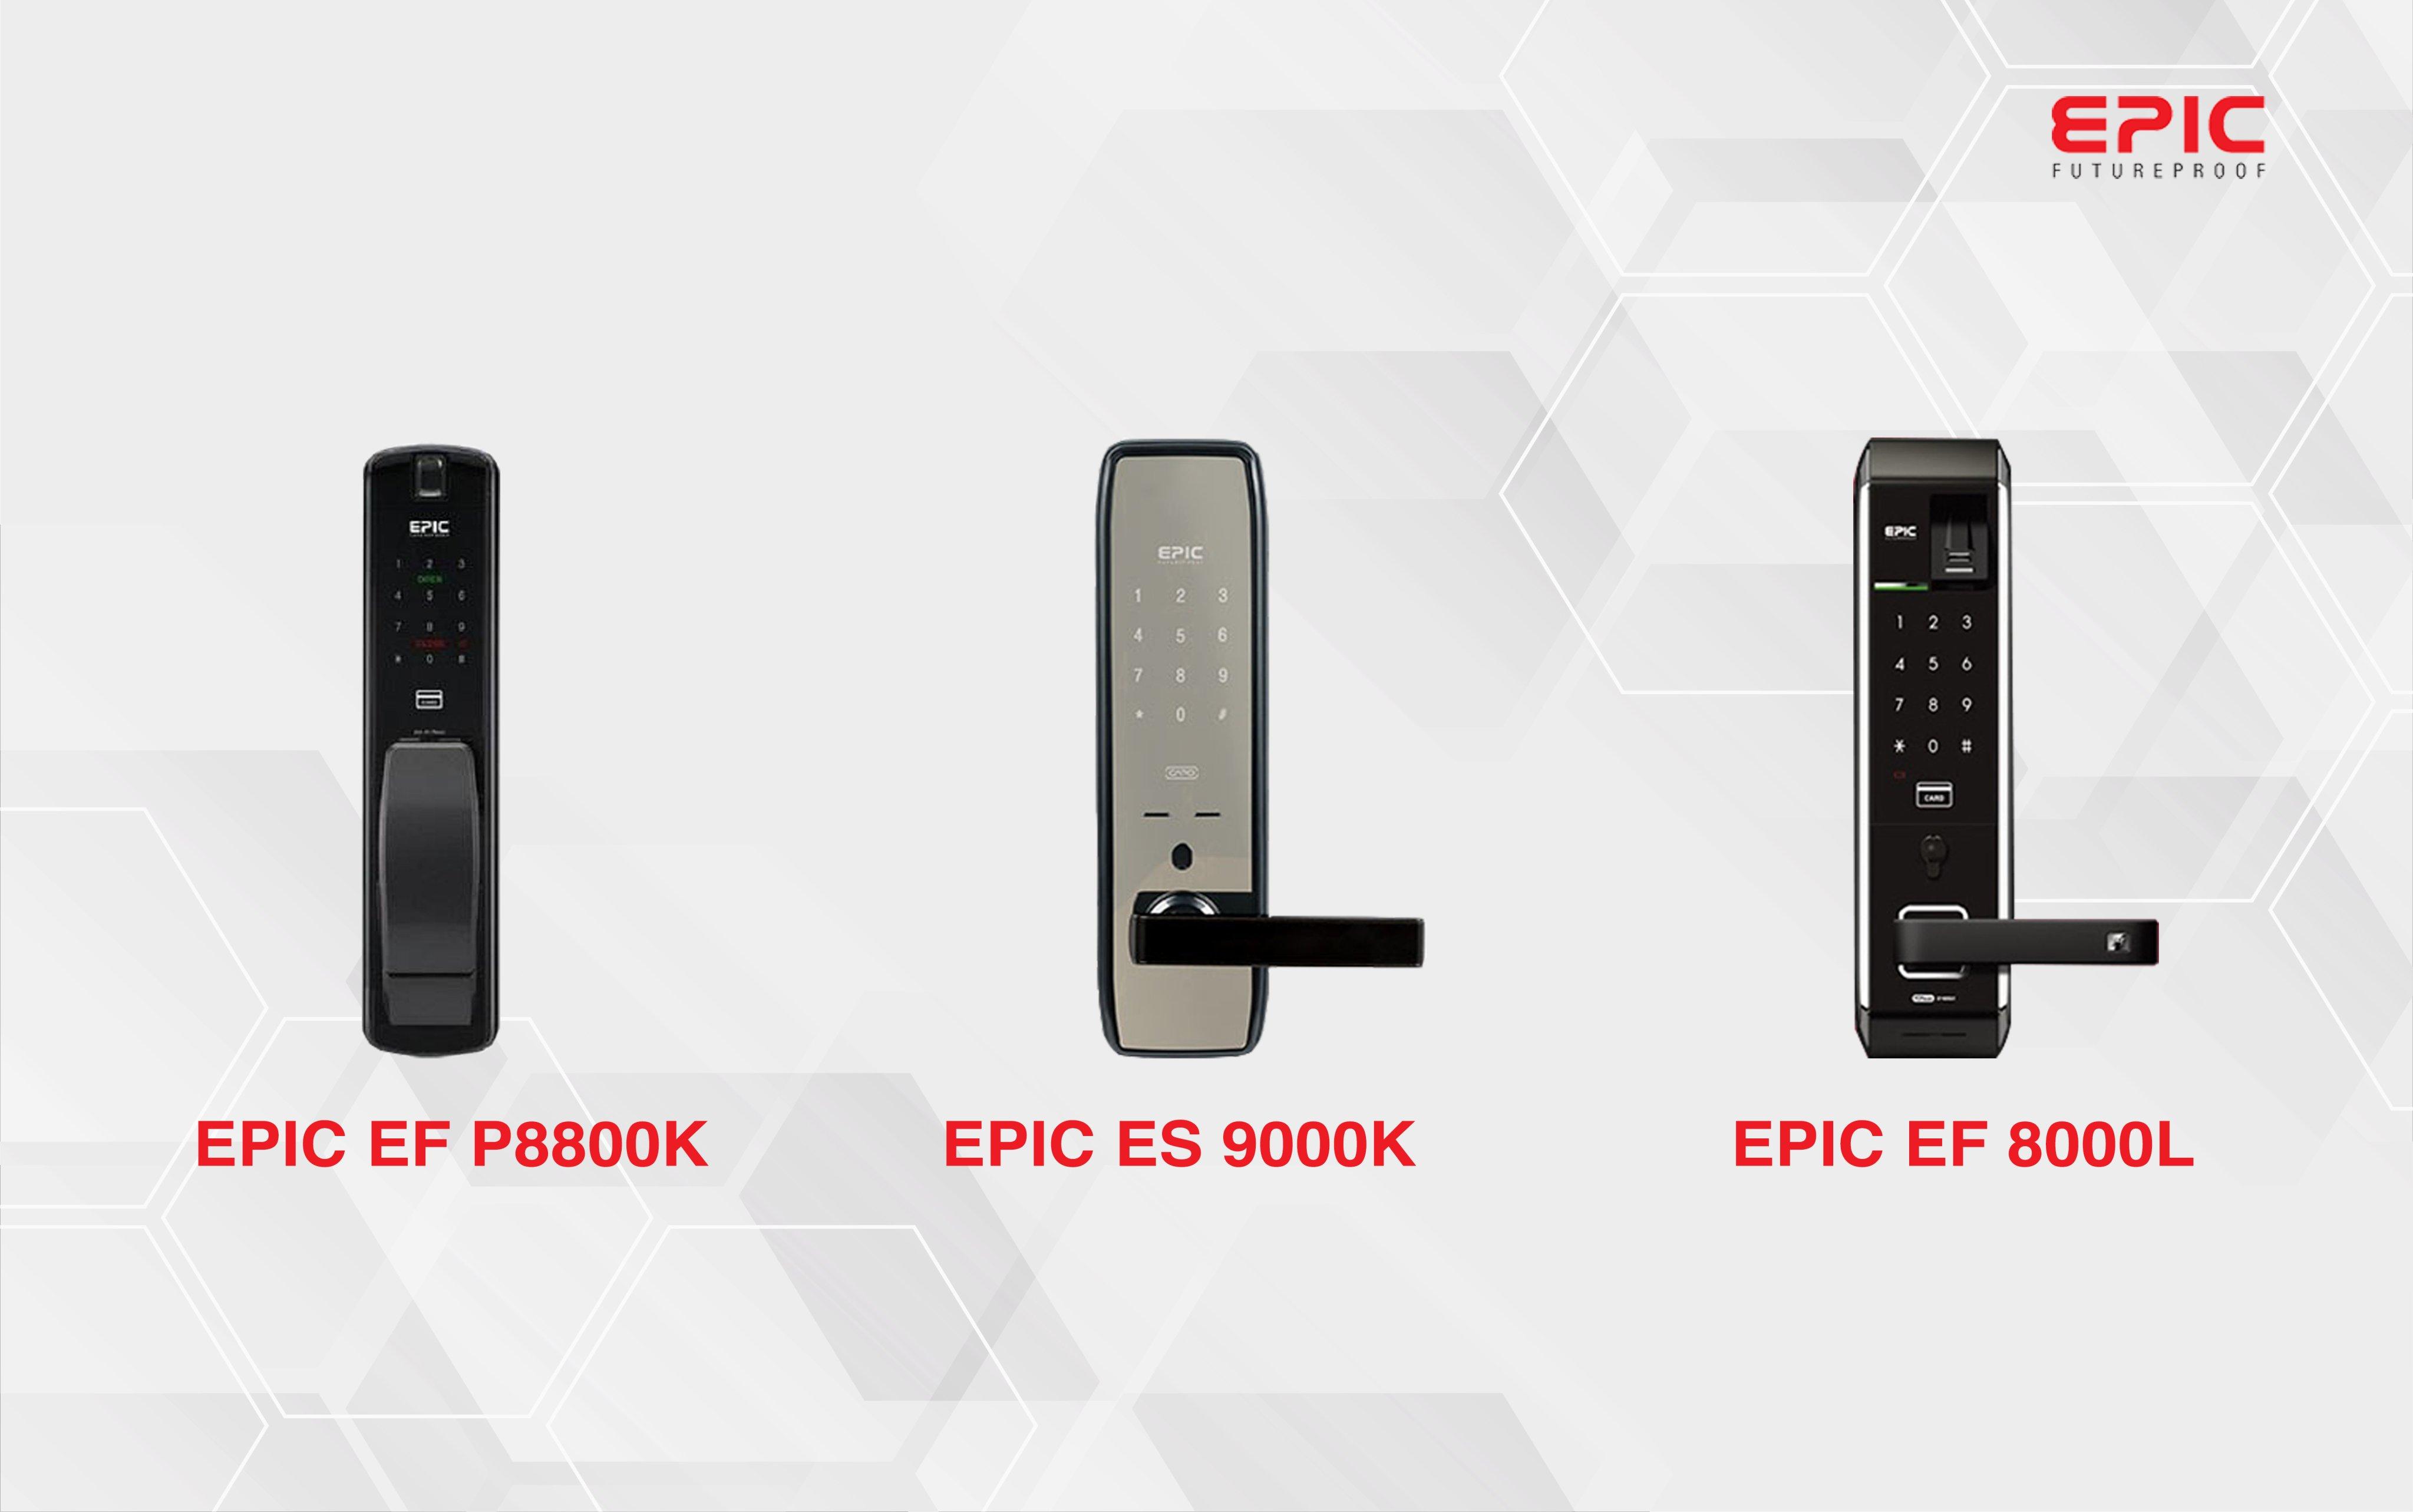 khoa-dien-tu-Epic-P8800K-8000L